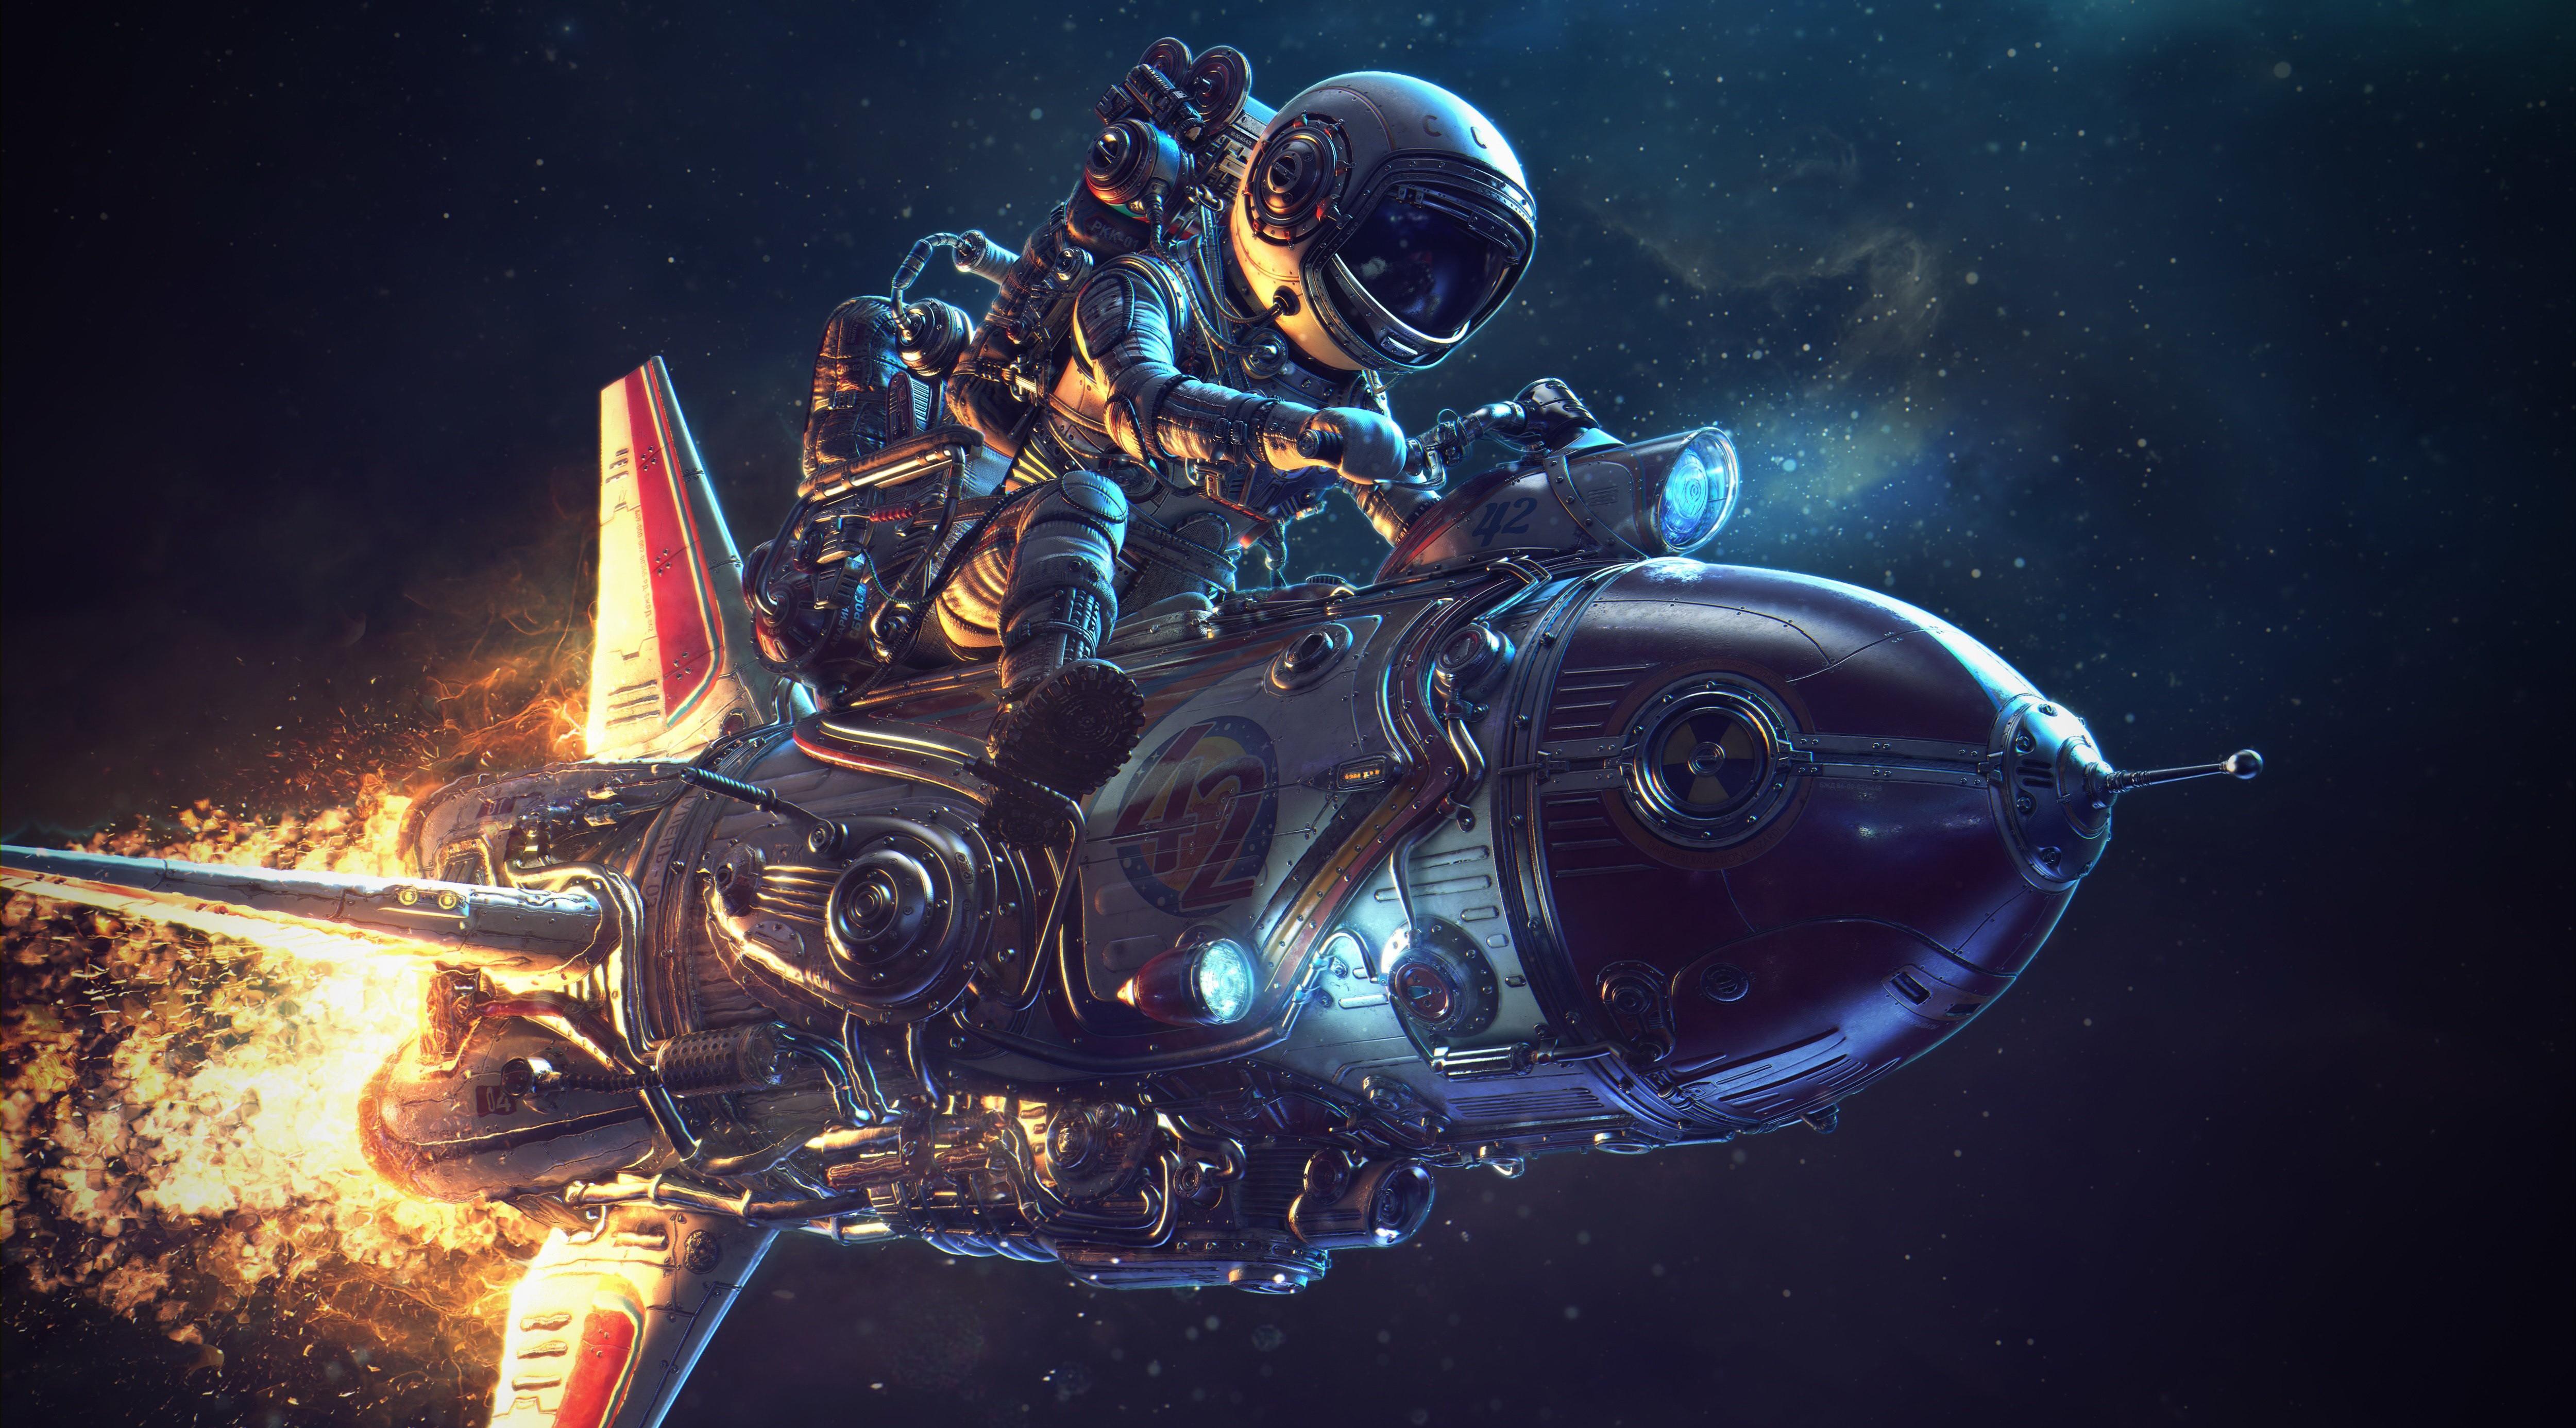 Astronaut Rocket Space 5000x2771